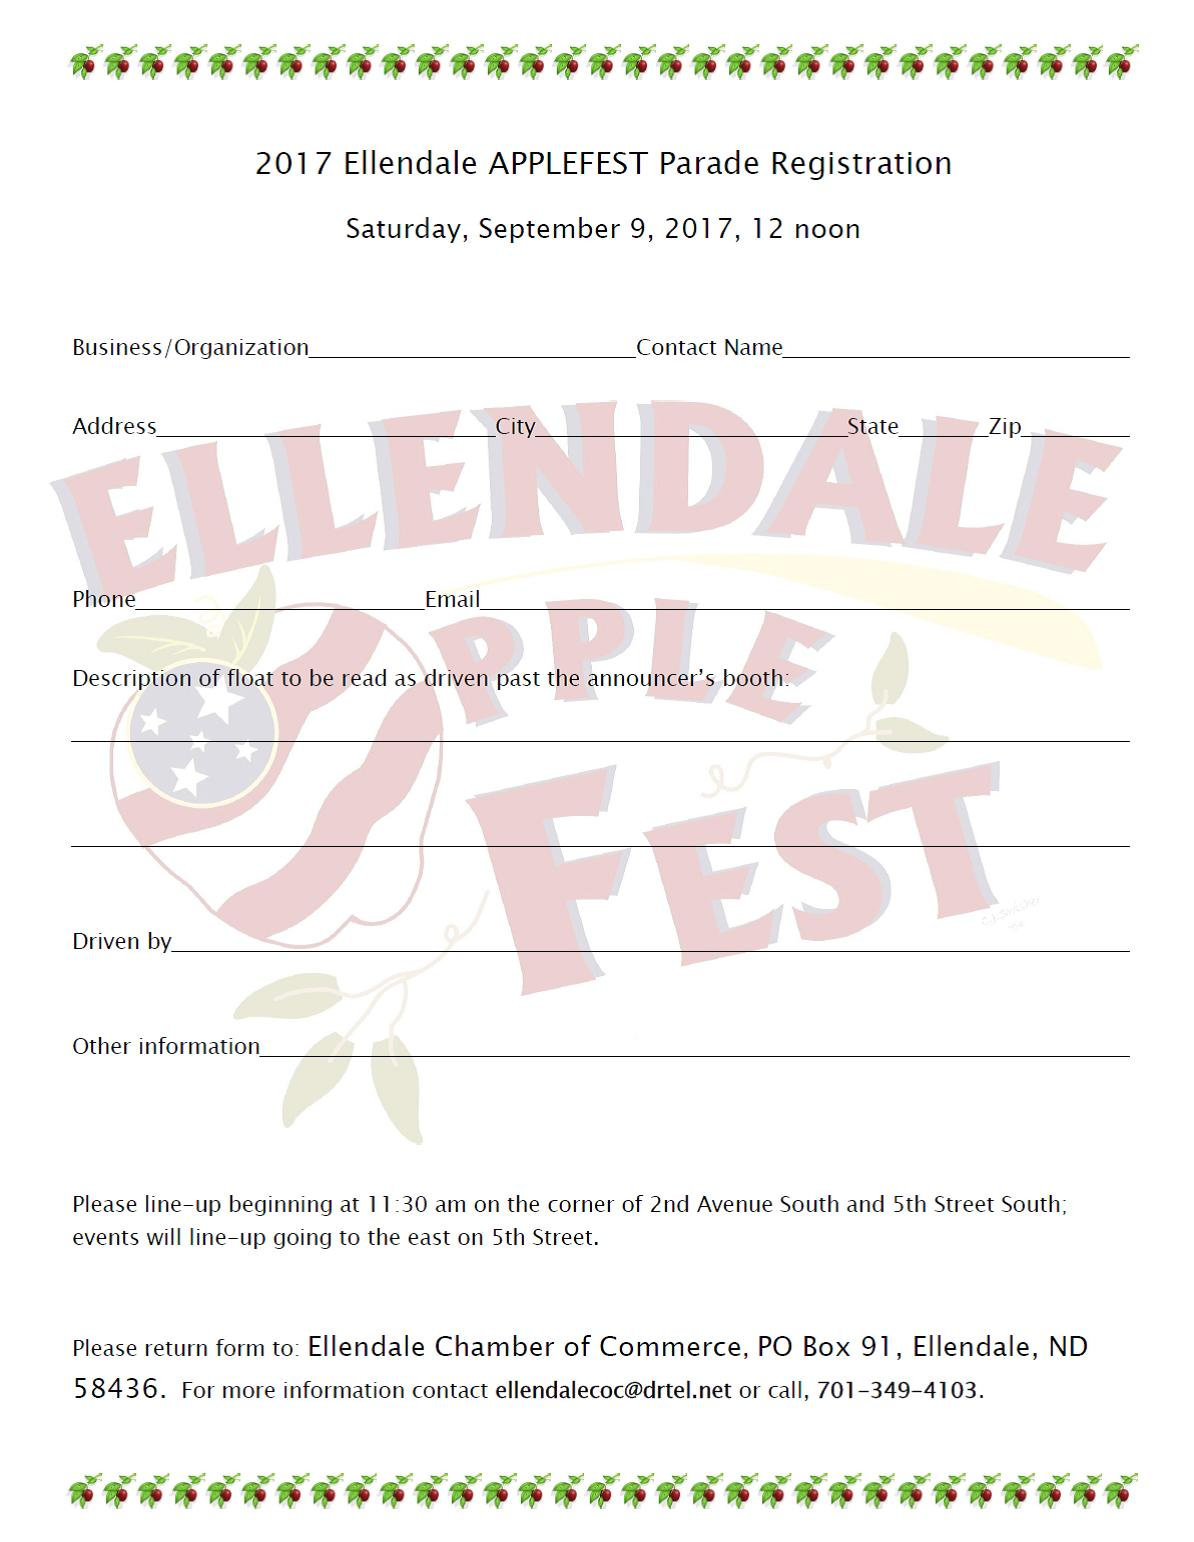 2017-Applefest-parade-registration-form.jpg